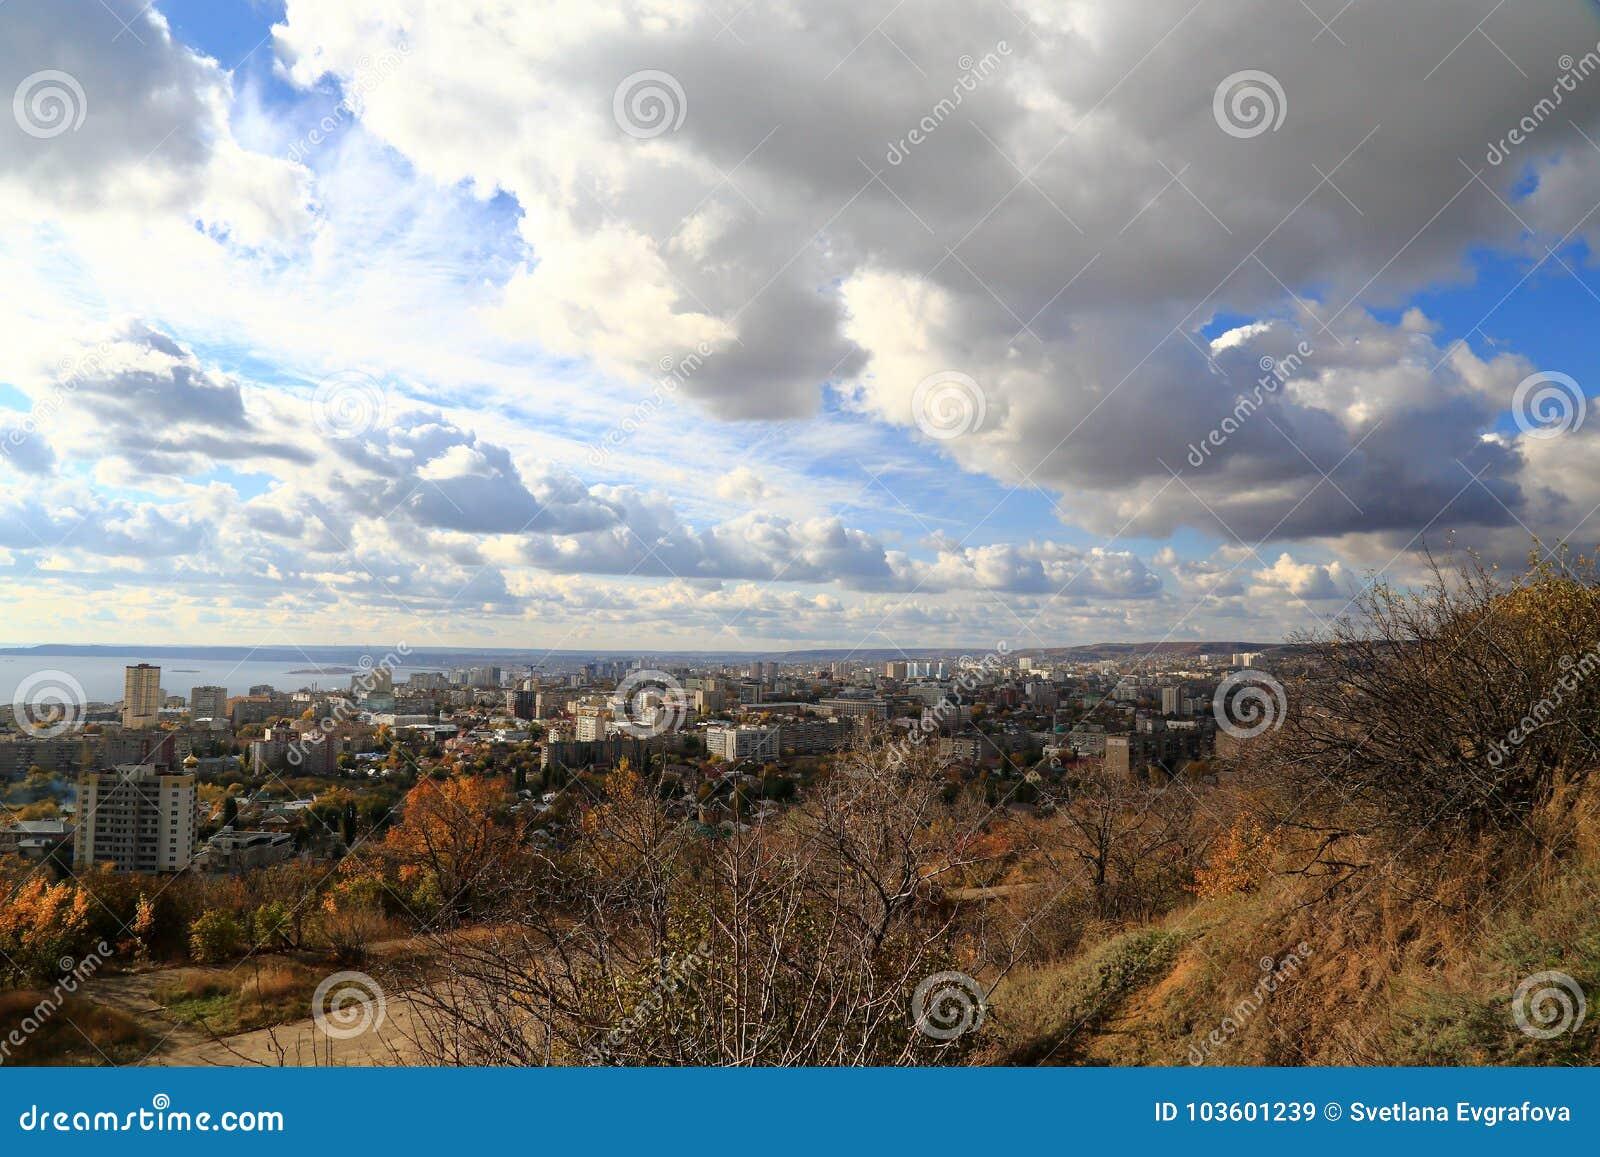 Staden av Saratov på banken av Volgaet River mot den blåa himlen Sikt från det Sokolovaya berget